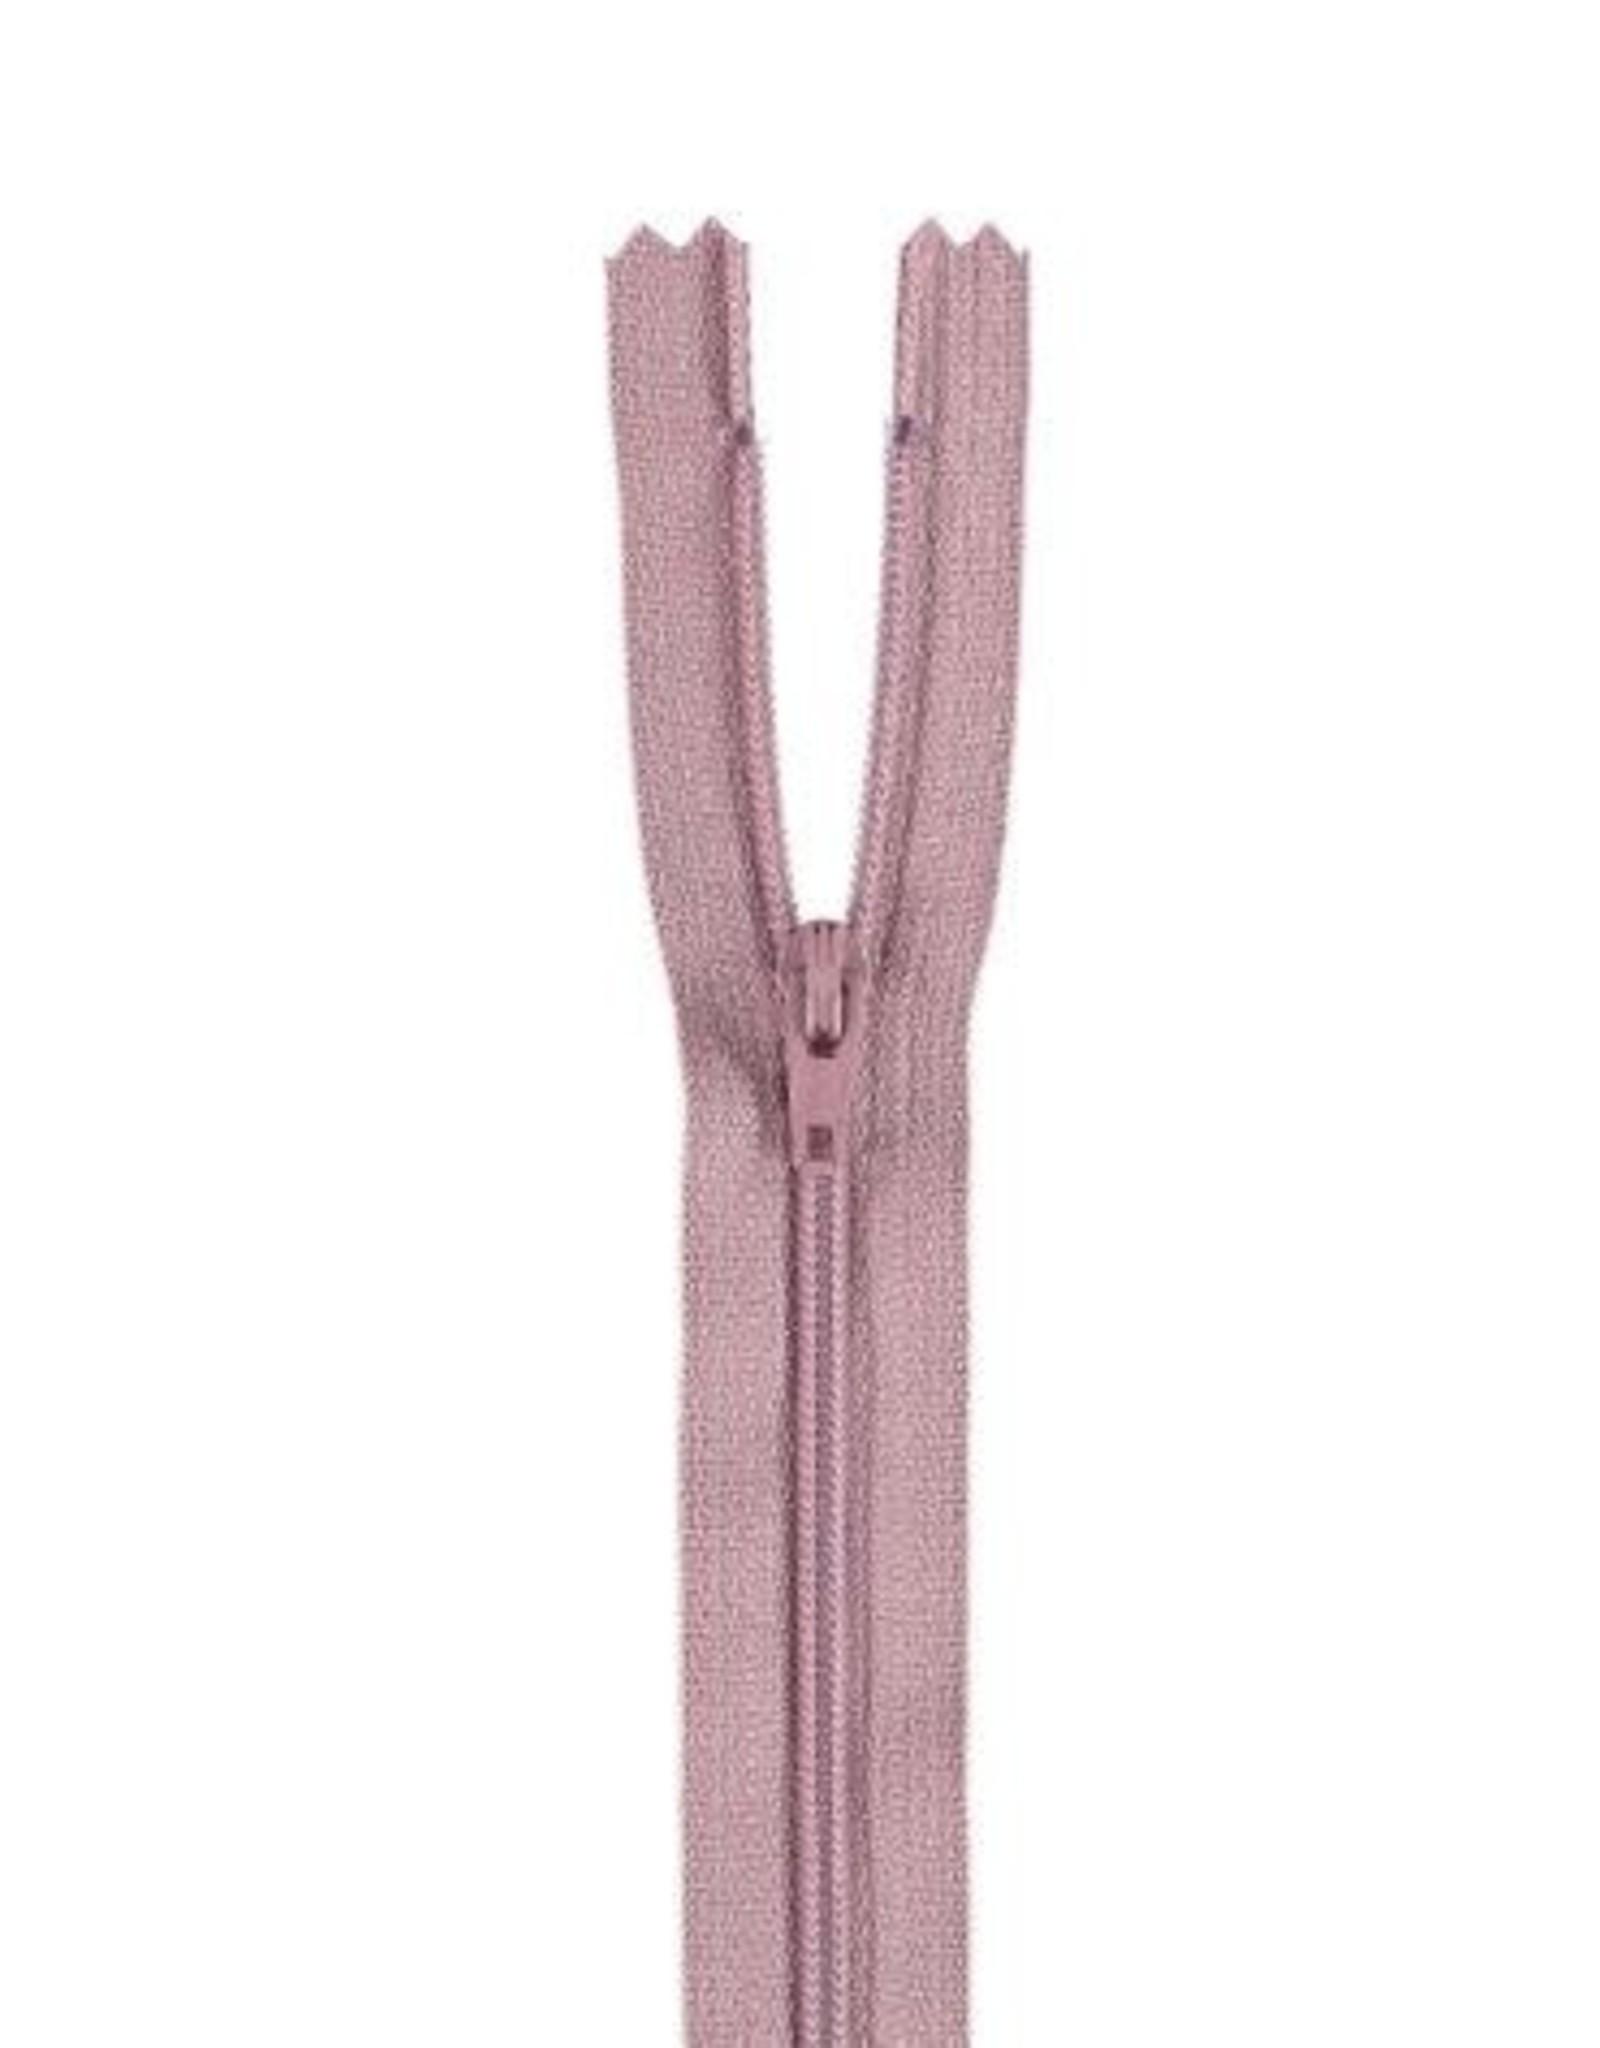 YKK Spiraalrits niet-DB 3mm oud roze 069-18cm